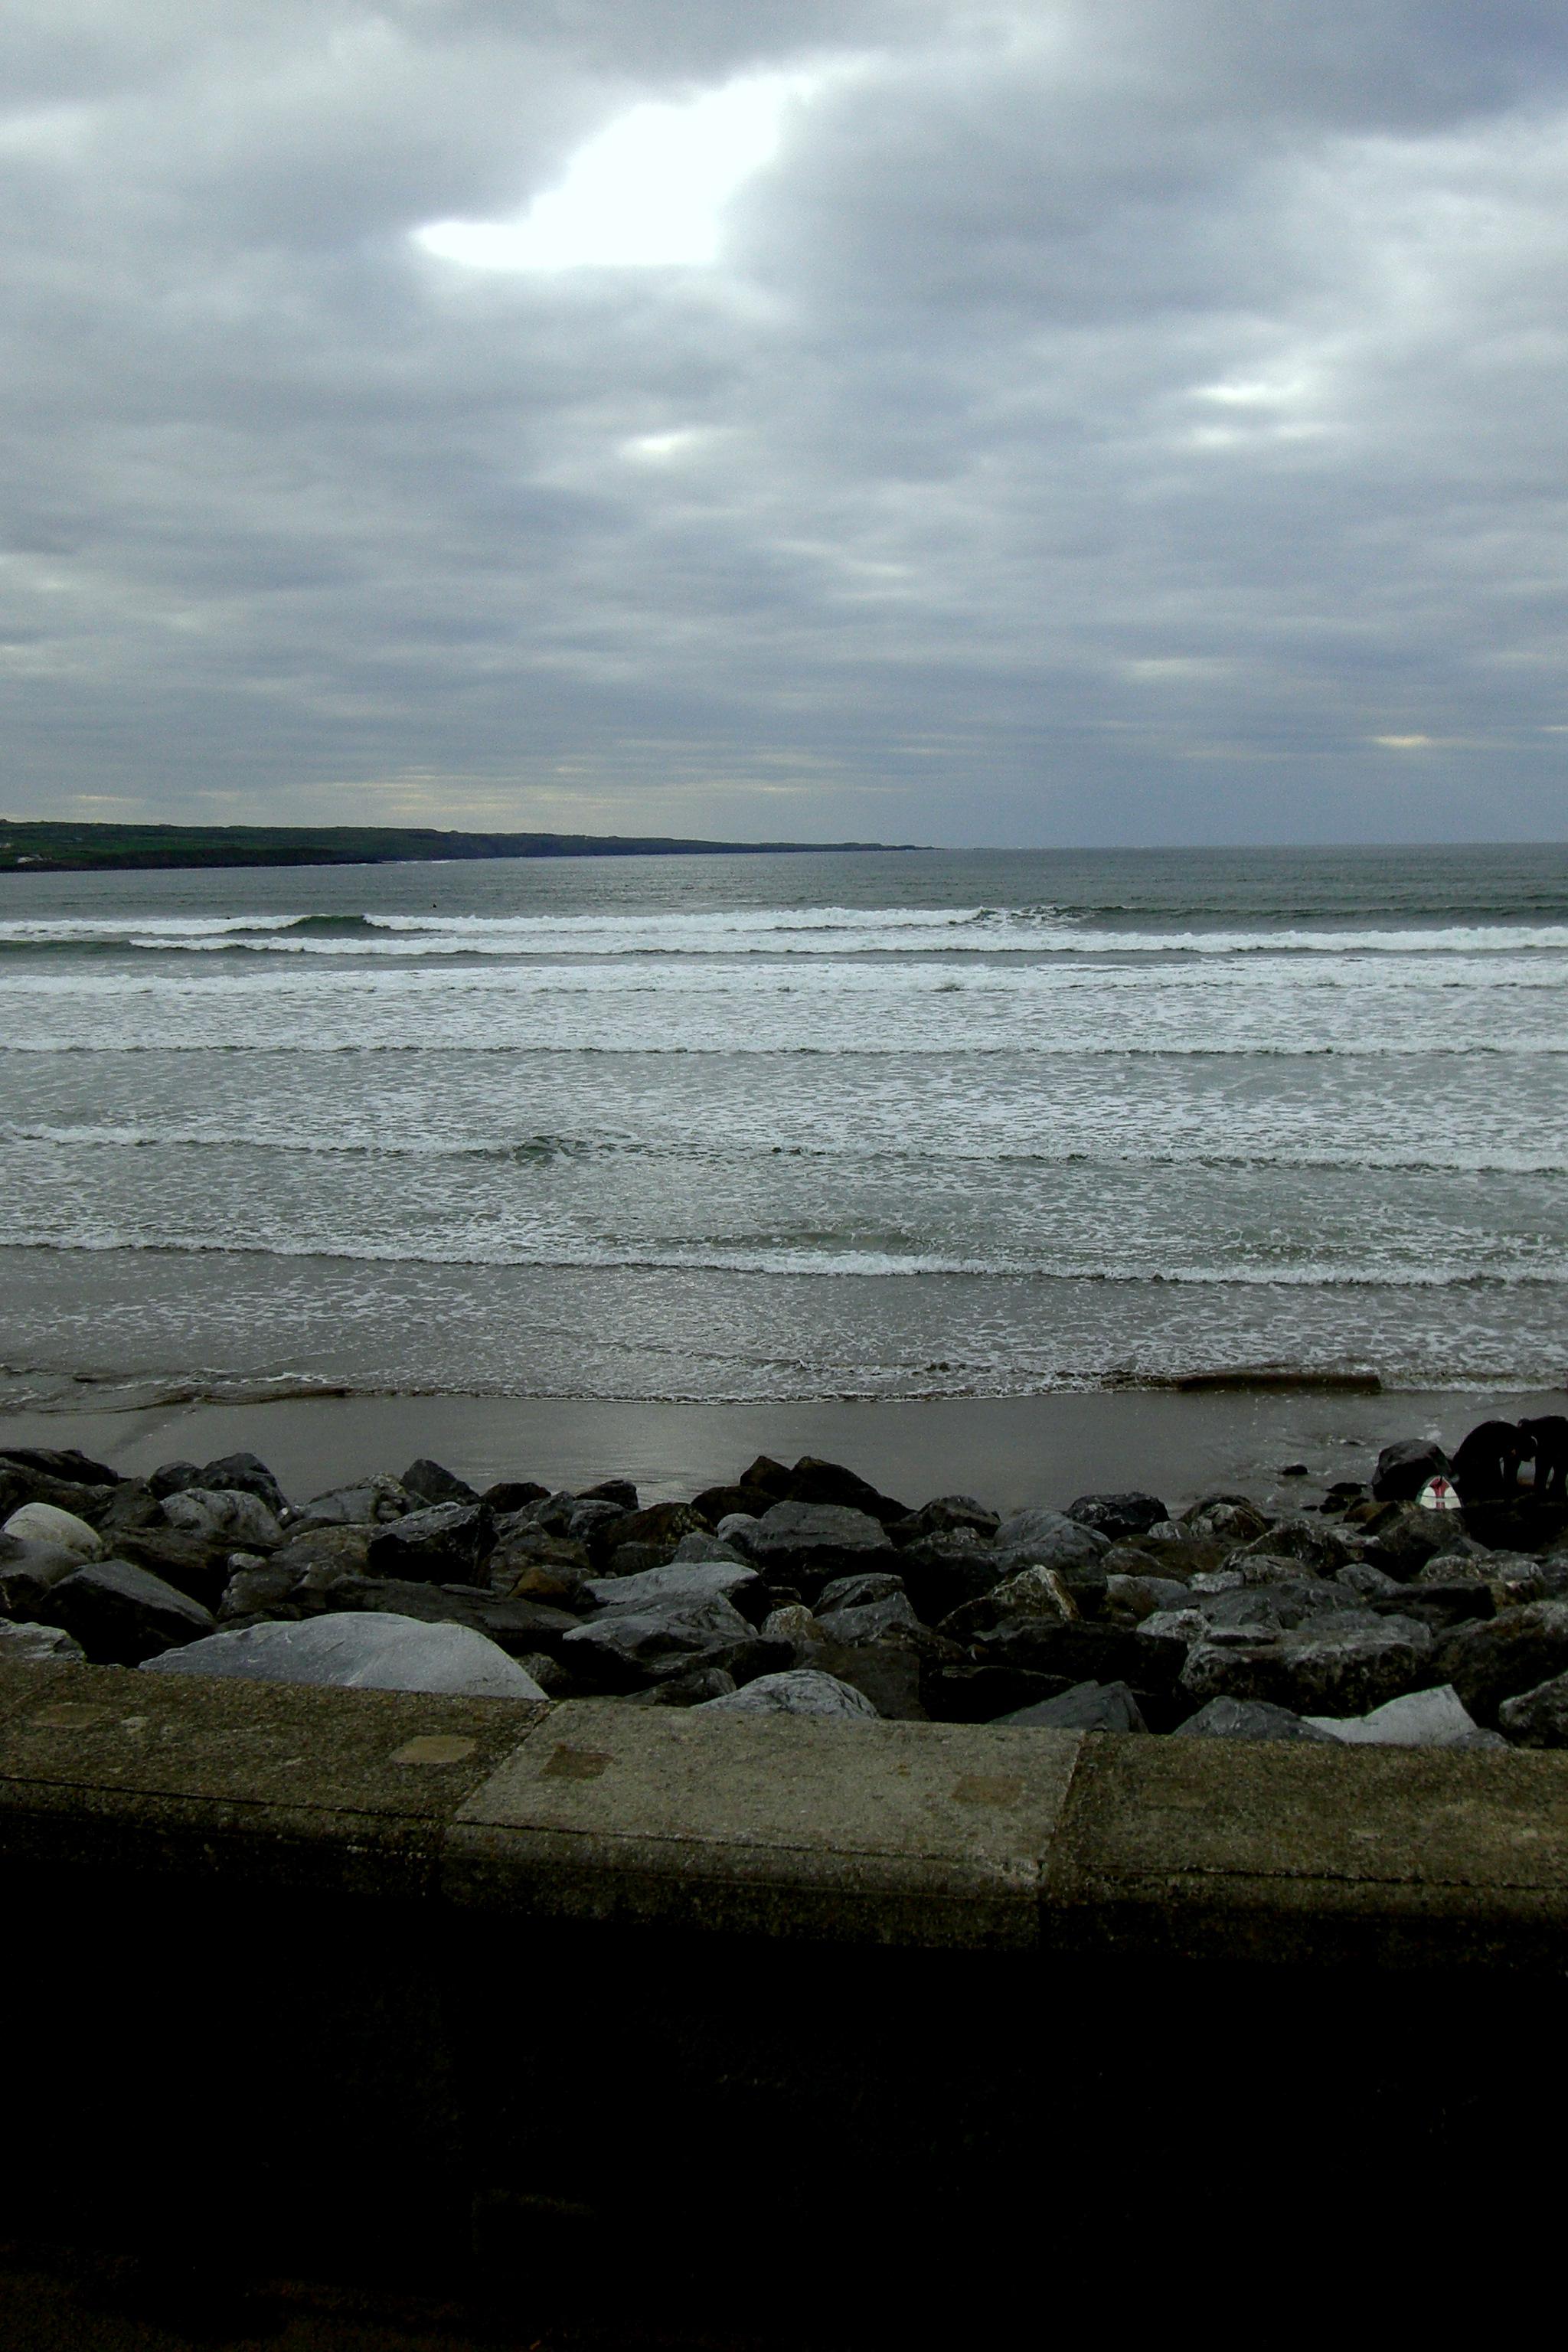 Galway Bay - Ireland, Atlantic, Beach, Clouds, Dark, HQ Photo